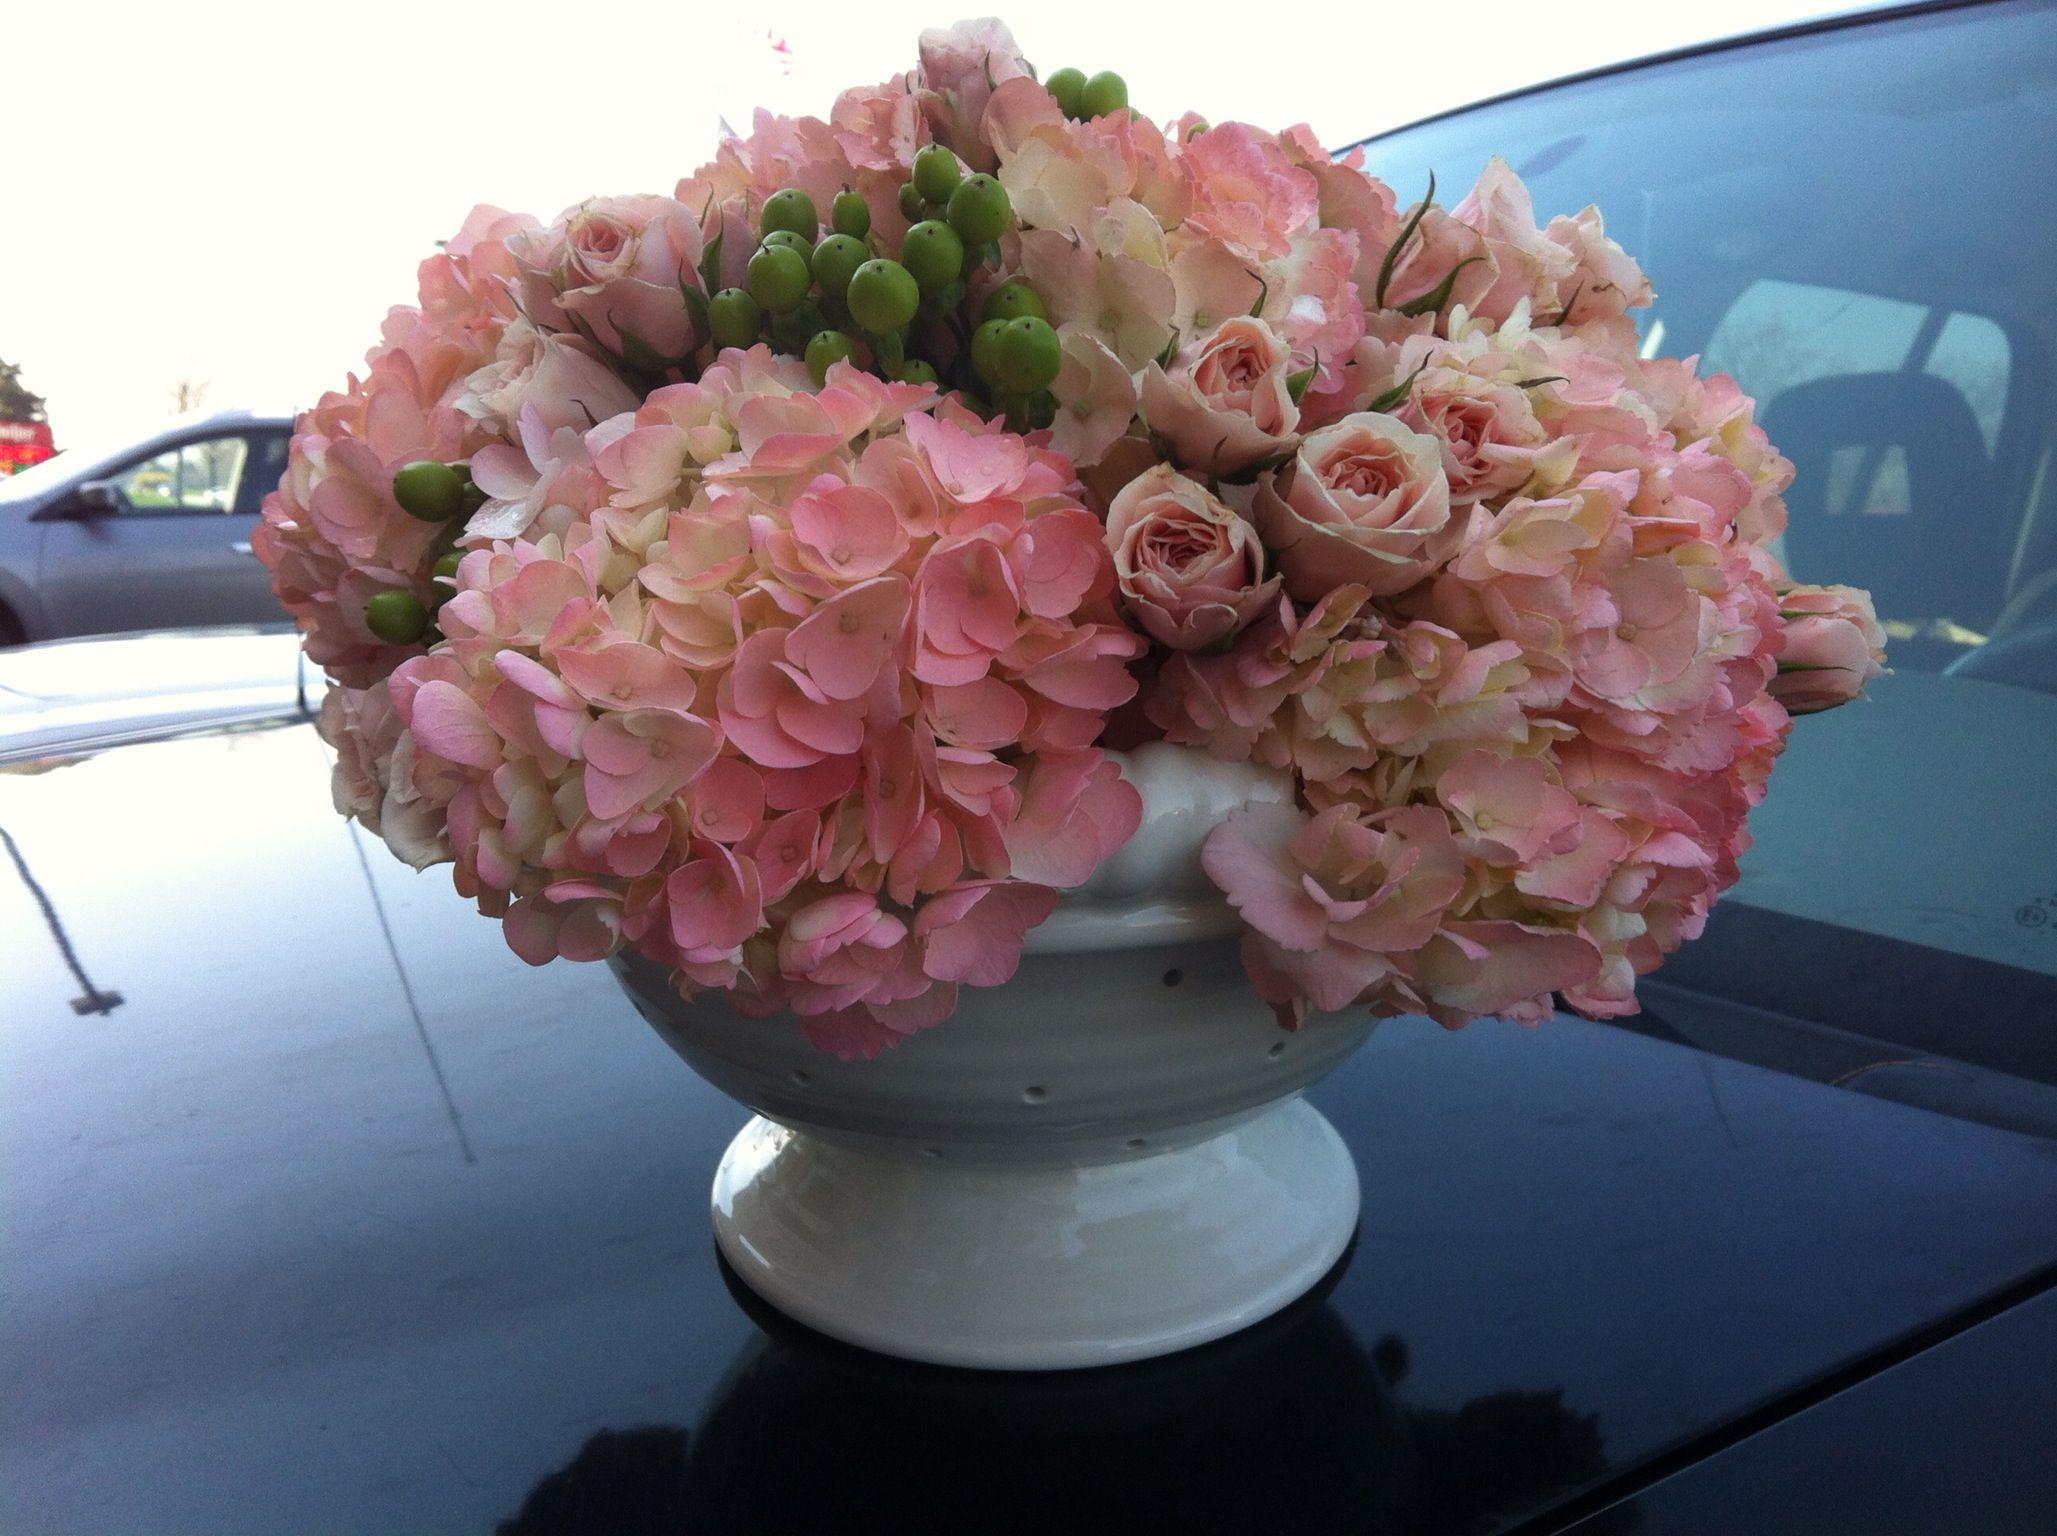 Shower flowers in a colander 5-2013